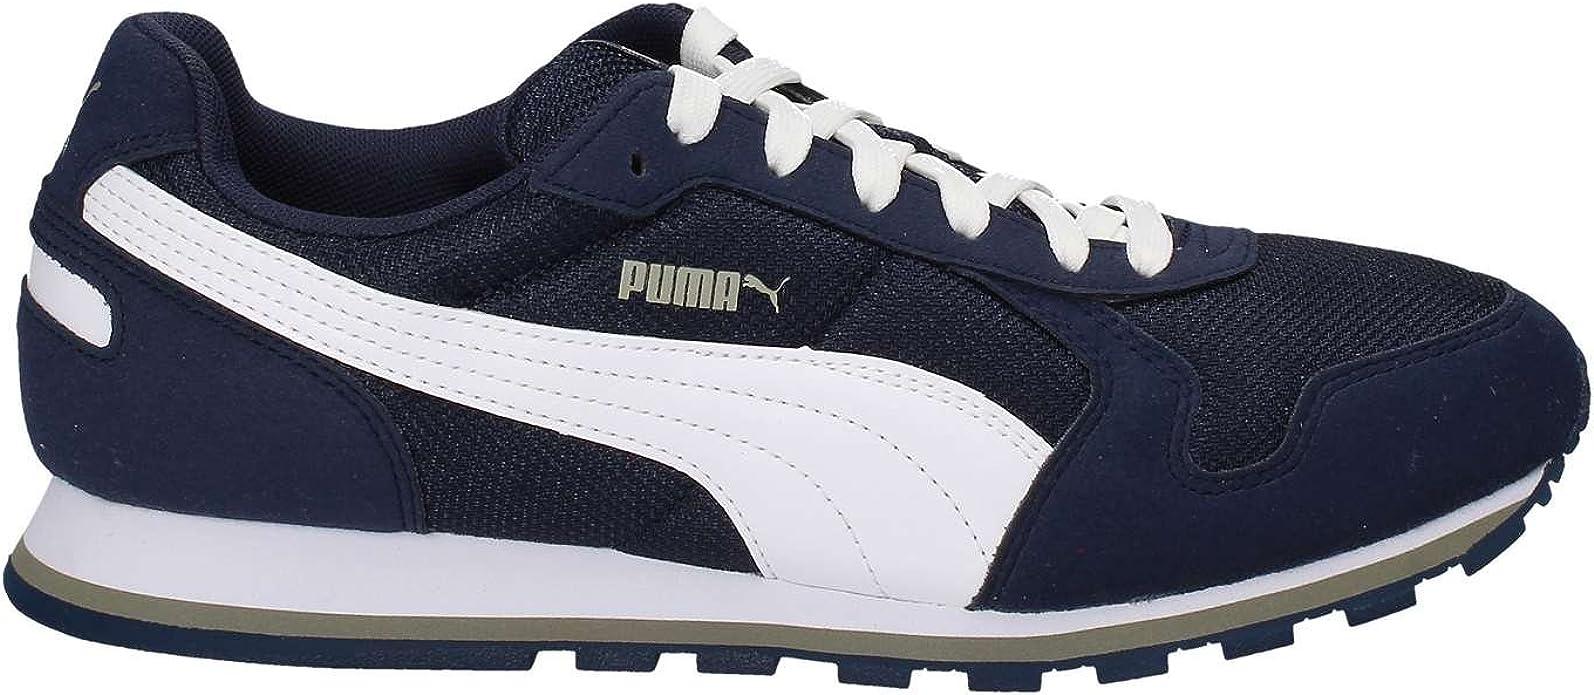 PUMA 359541 06 Sneakers Herren WildlederNylon Blau Blau 39